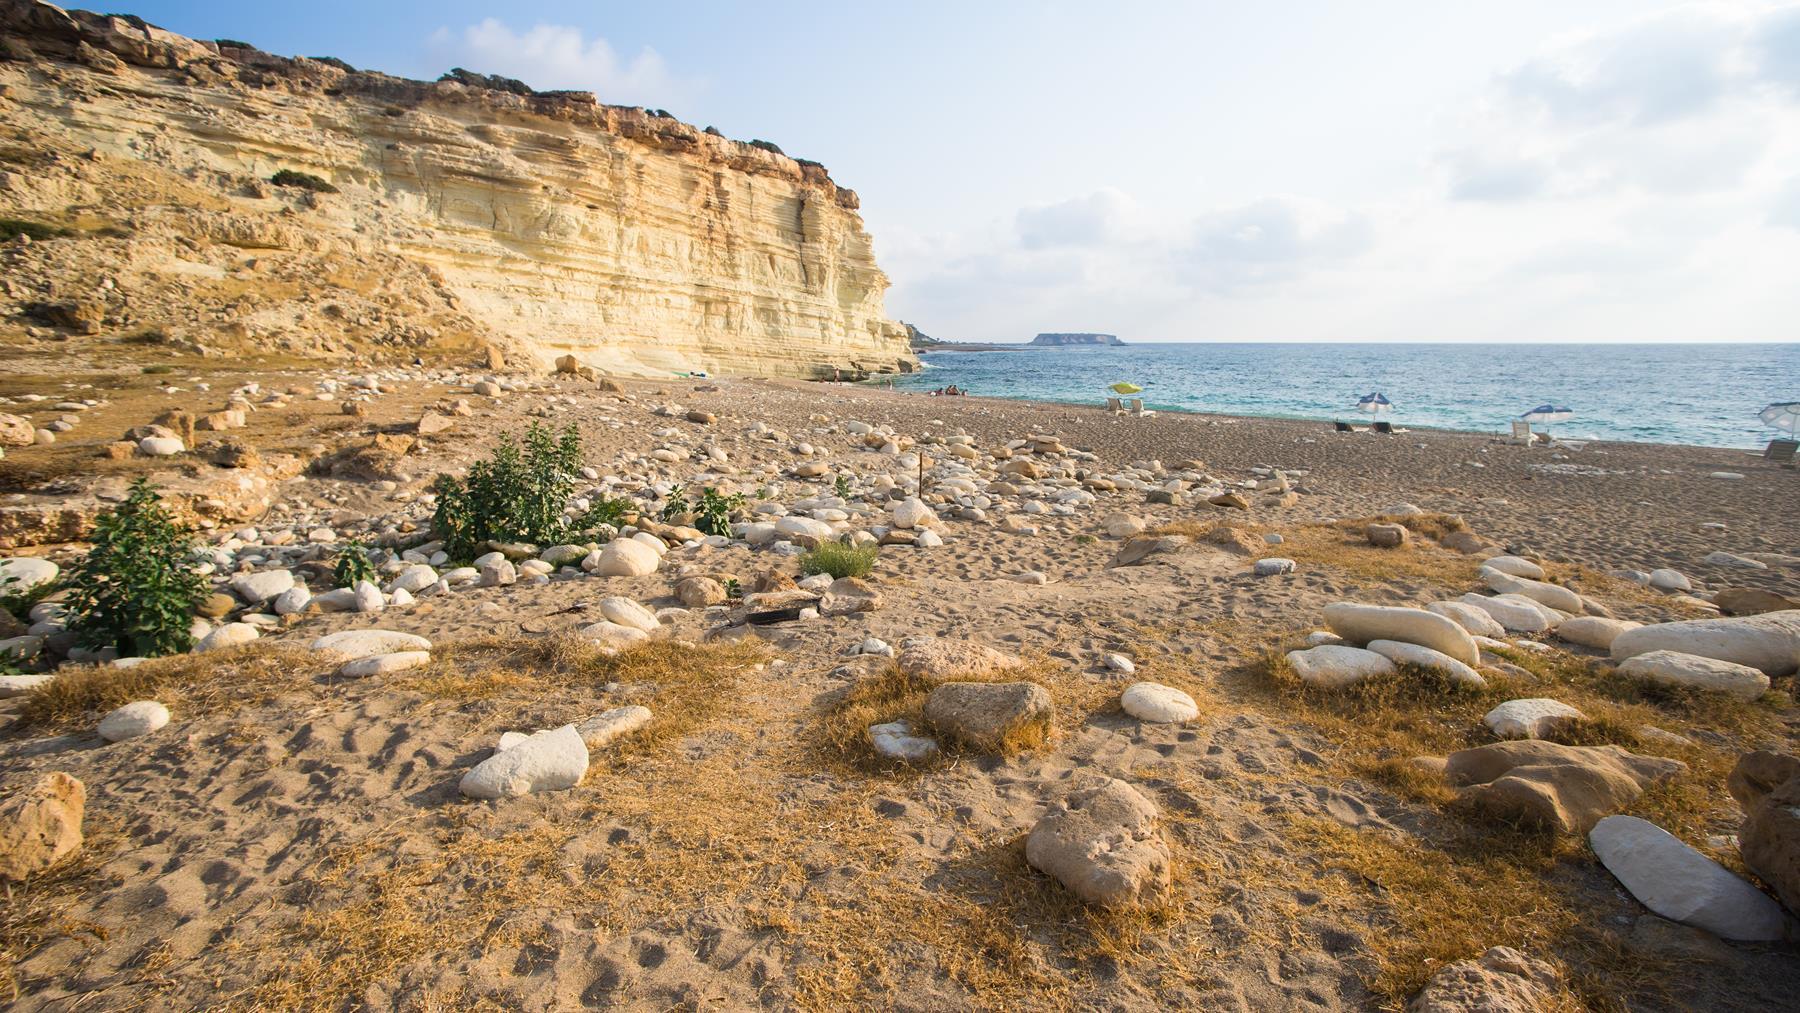 Красивый вид на море пляжа Пафоса